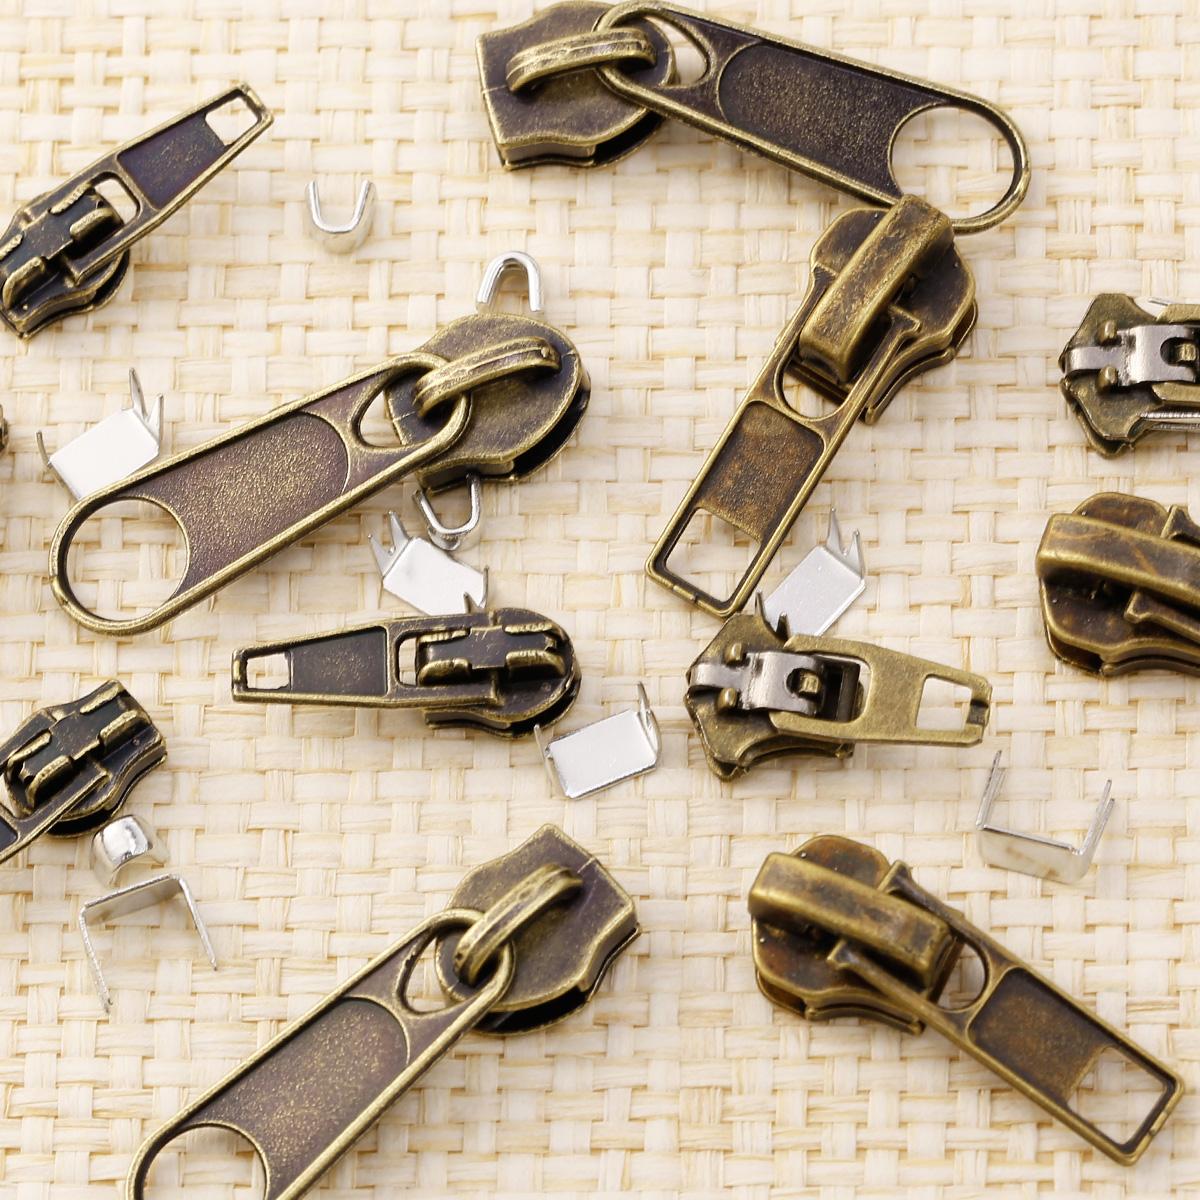 22pcs universal zipper fix zip slider rescue instant repair kit replacement ebay. Black Bedroom Furniture Sets. Home Design Ideas